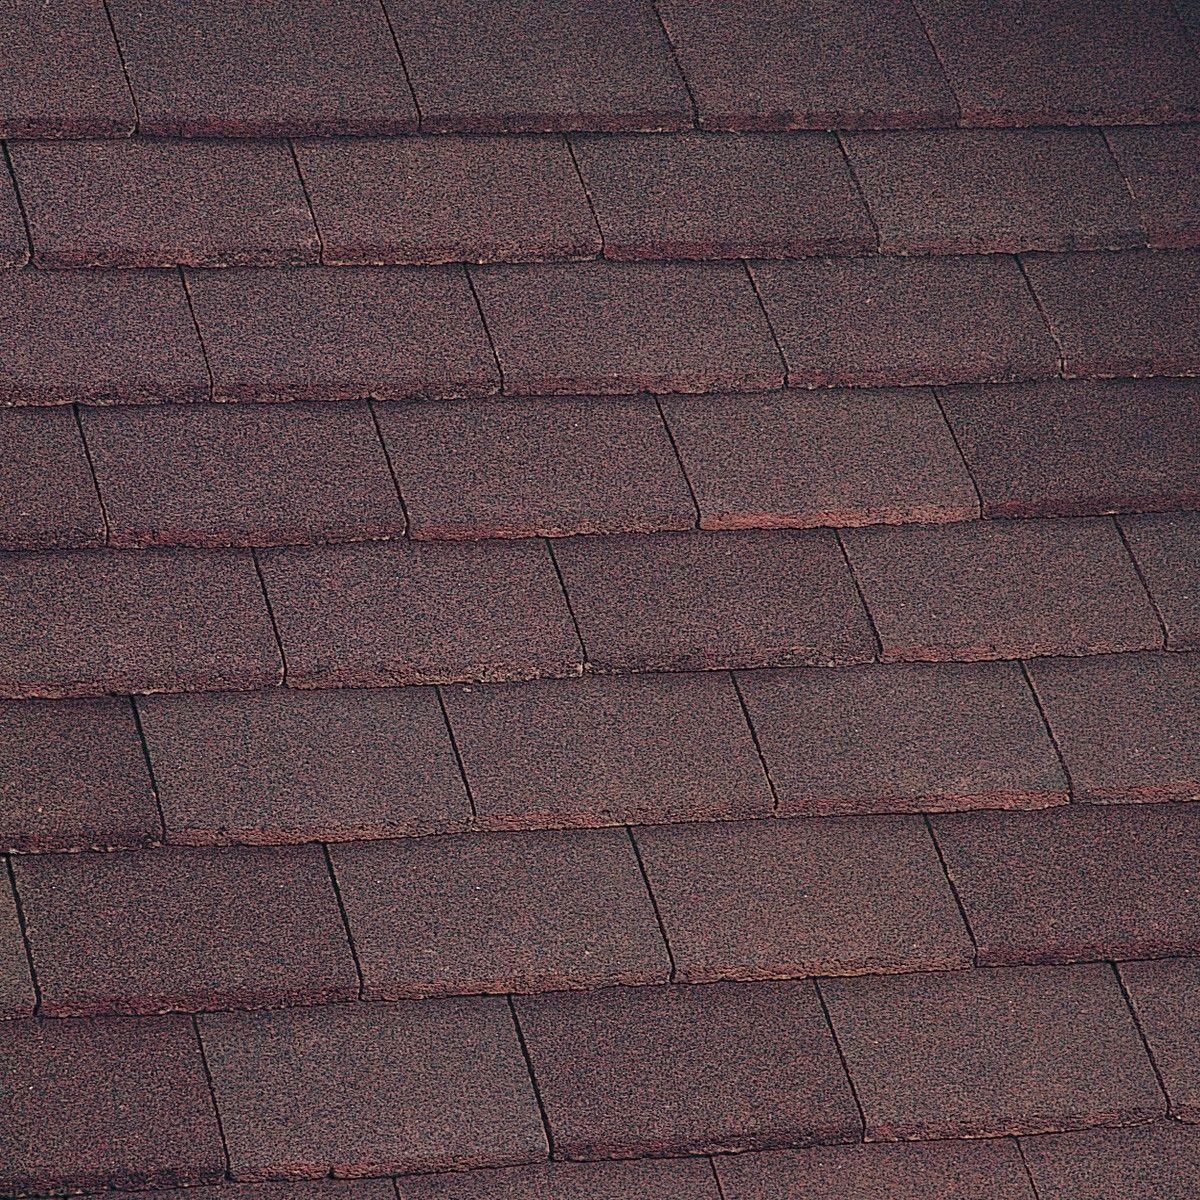 Marley Concrete Dark Red Plain Tile